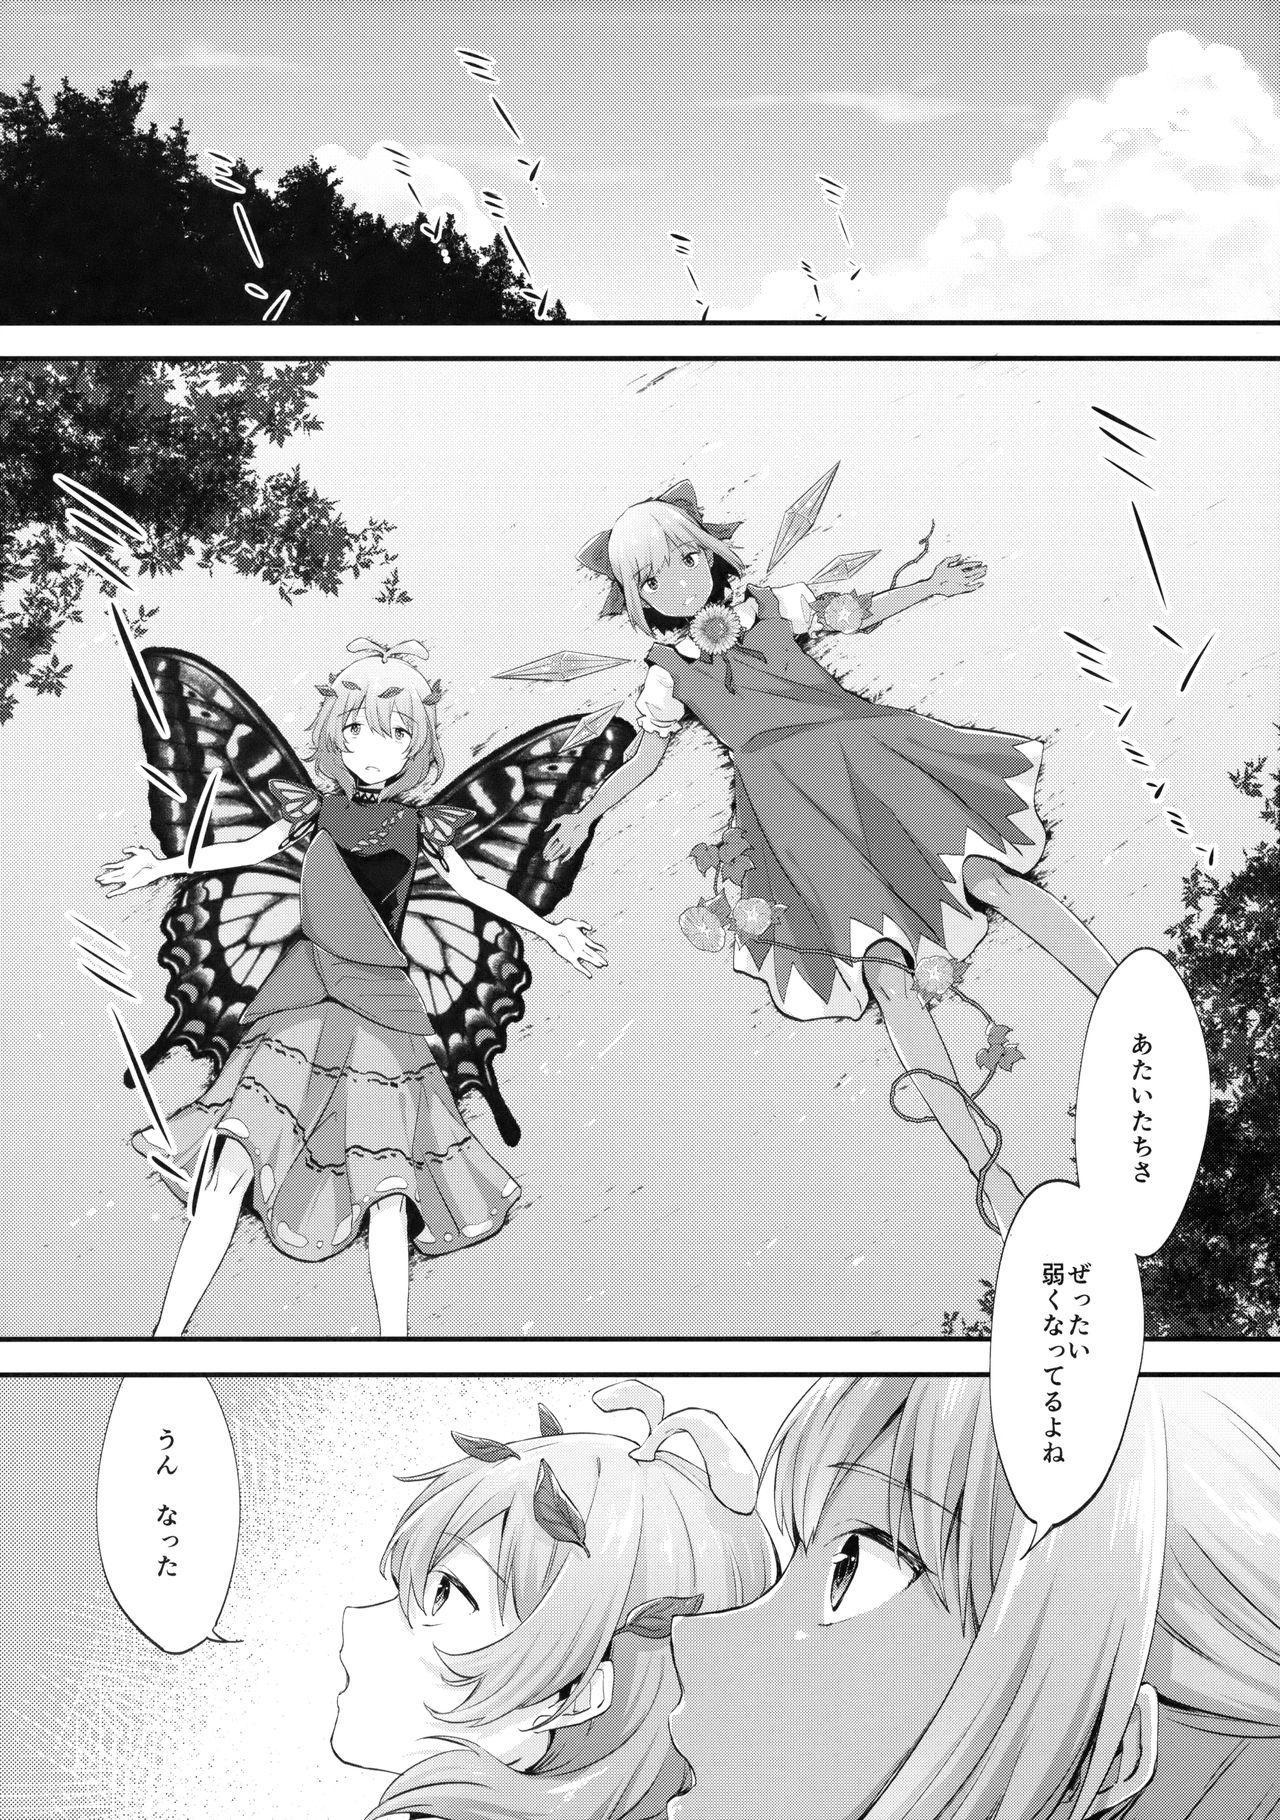 Manatsu no Rival 3